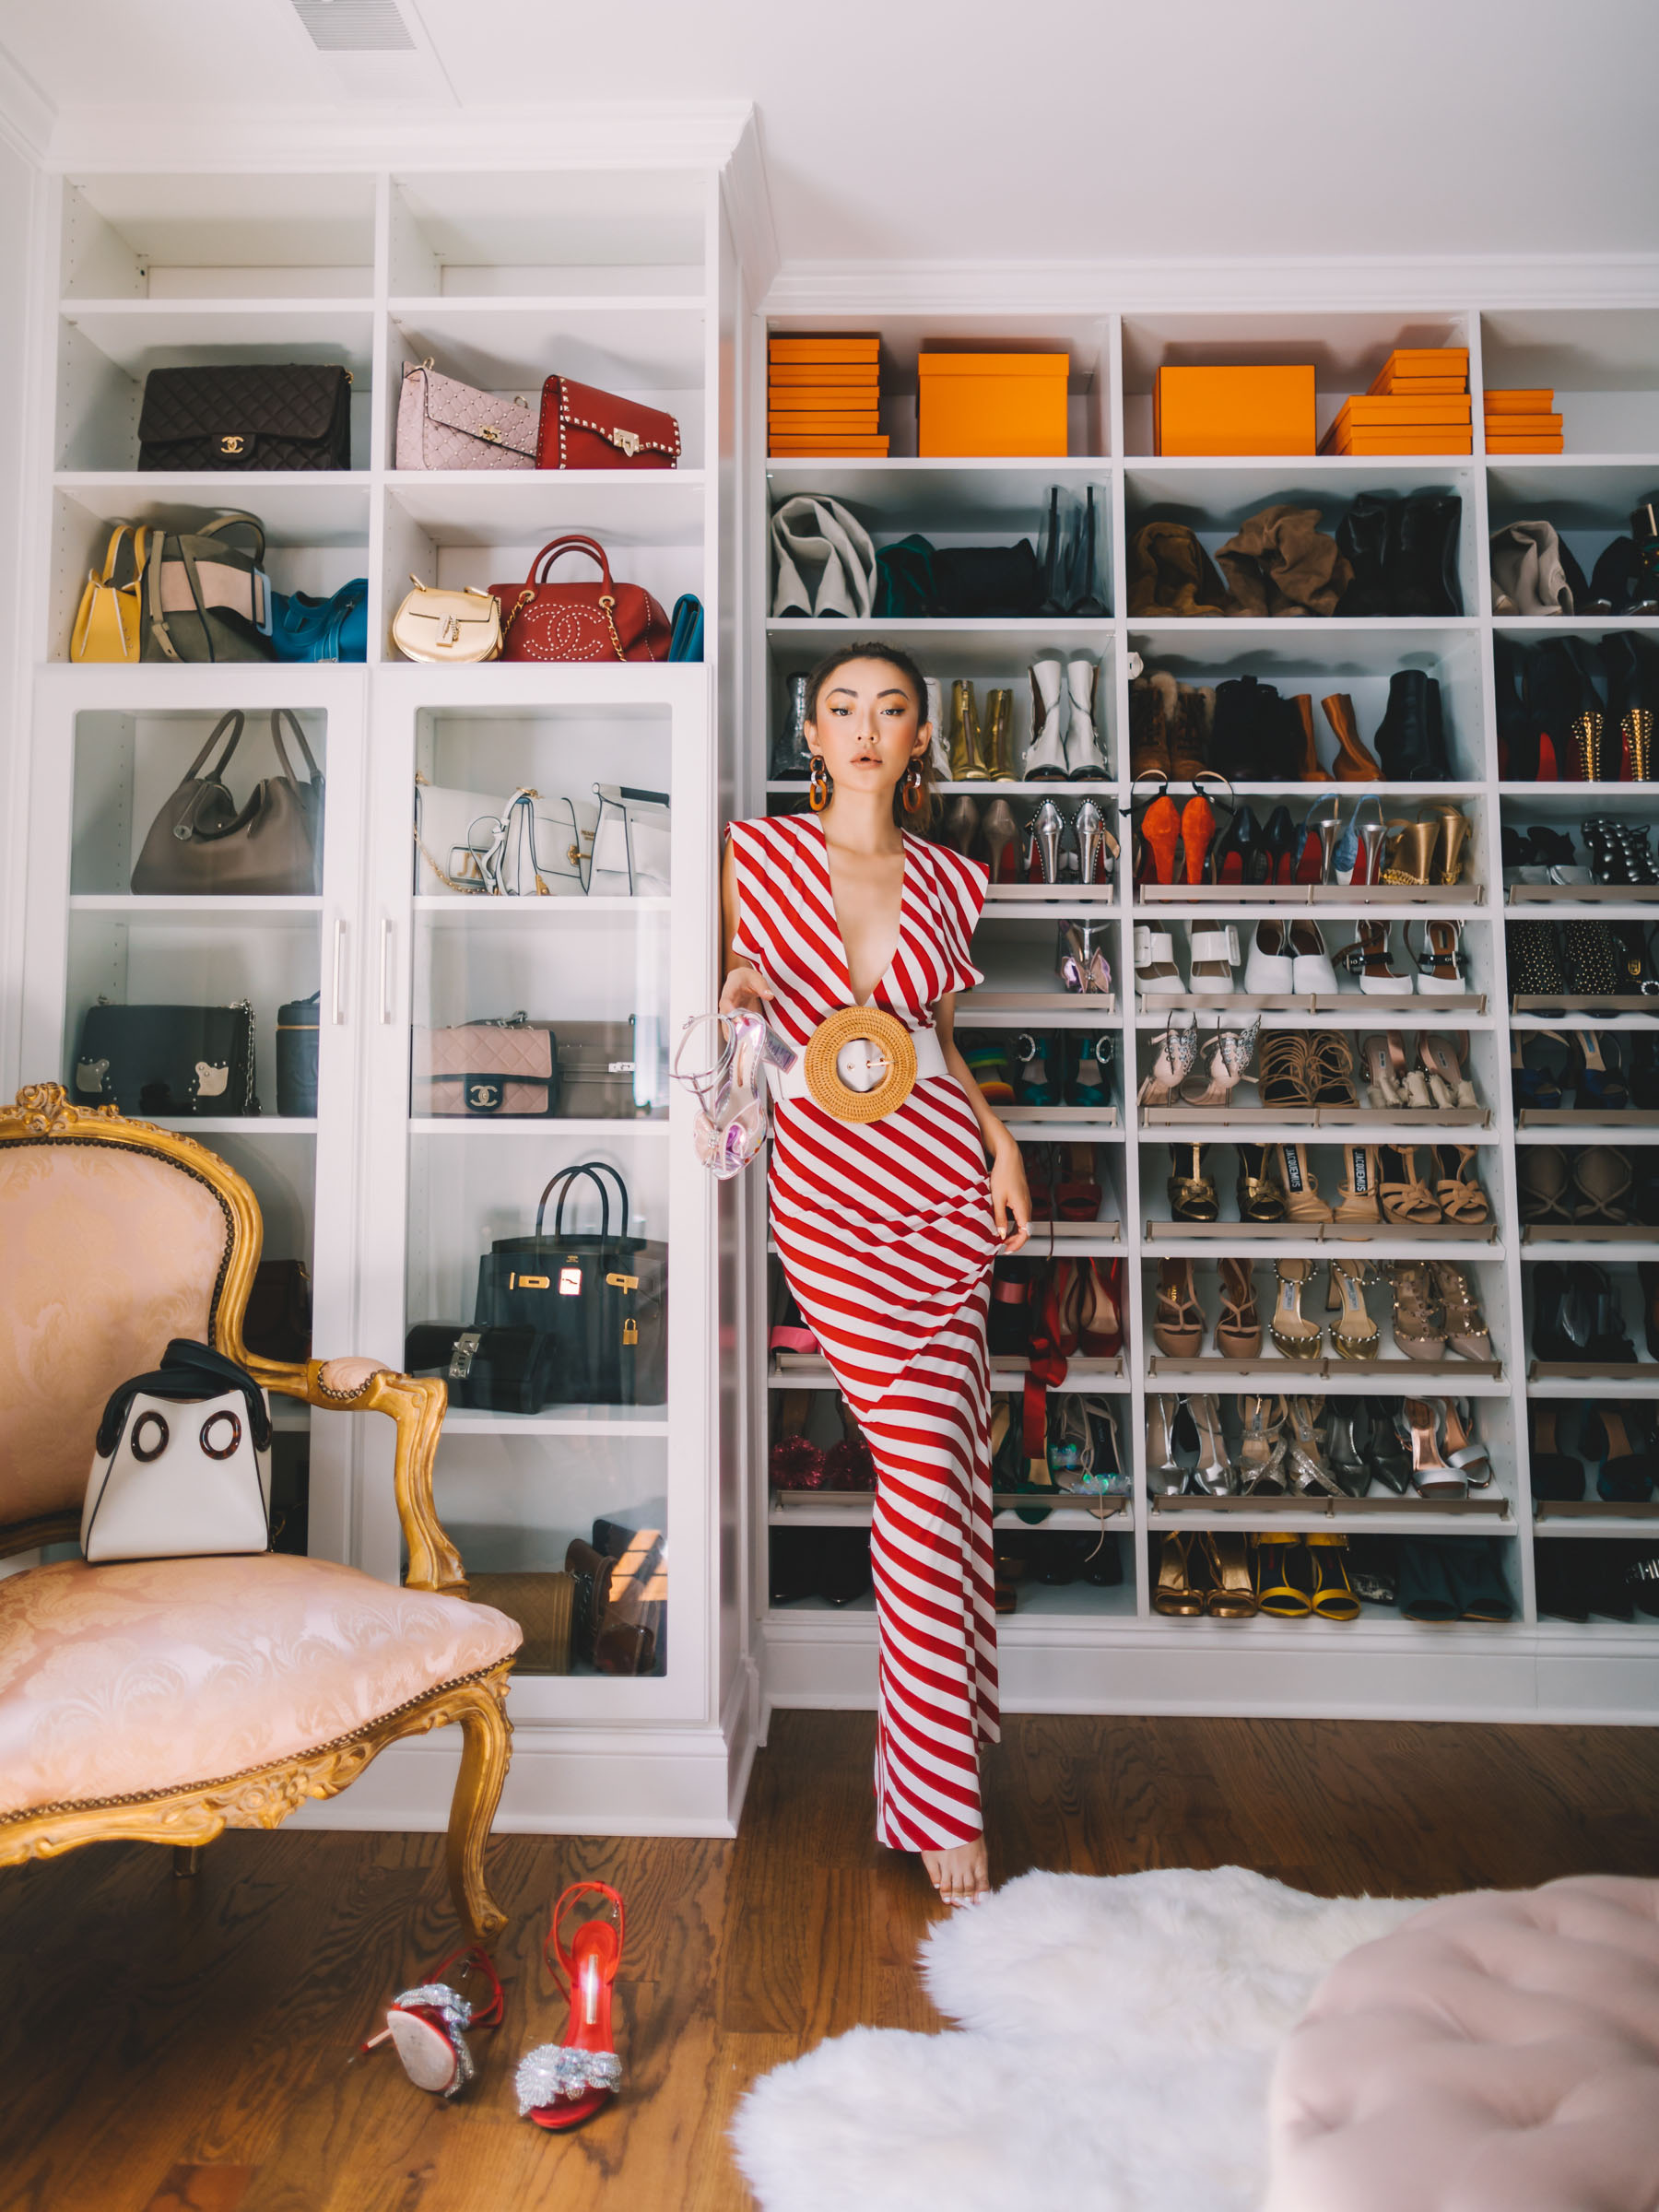 life hack products from amazon, red stripe dress, fashion blogger closet, fashion blogger bag collection, luxury fashion, nyc fashion blogger // Notjessfashion.com